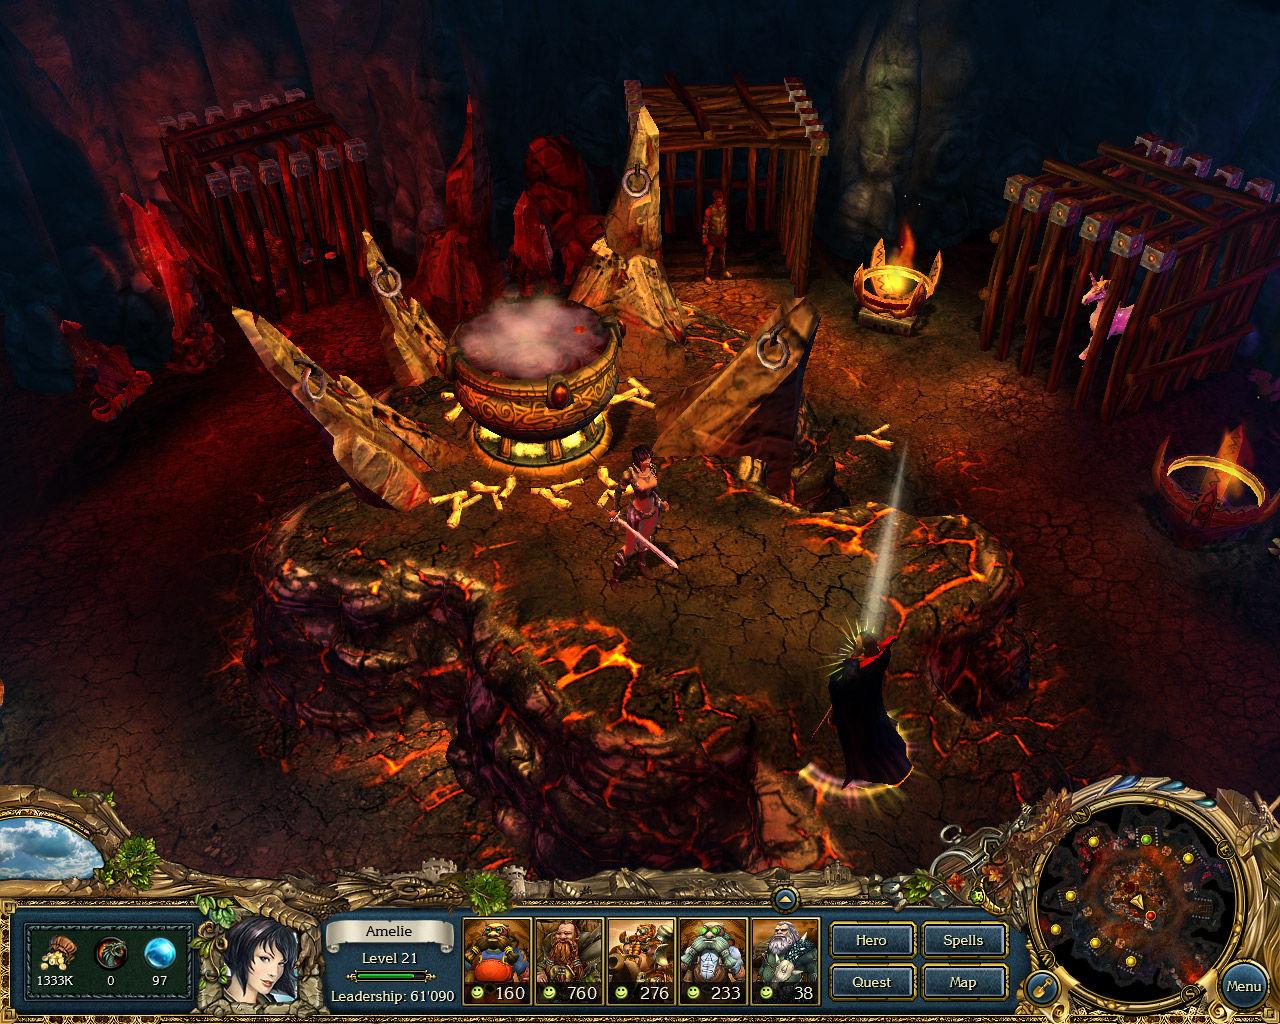 King's Bounty: Crossworlds GOTY screenshot 2